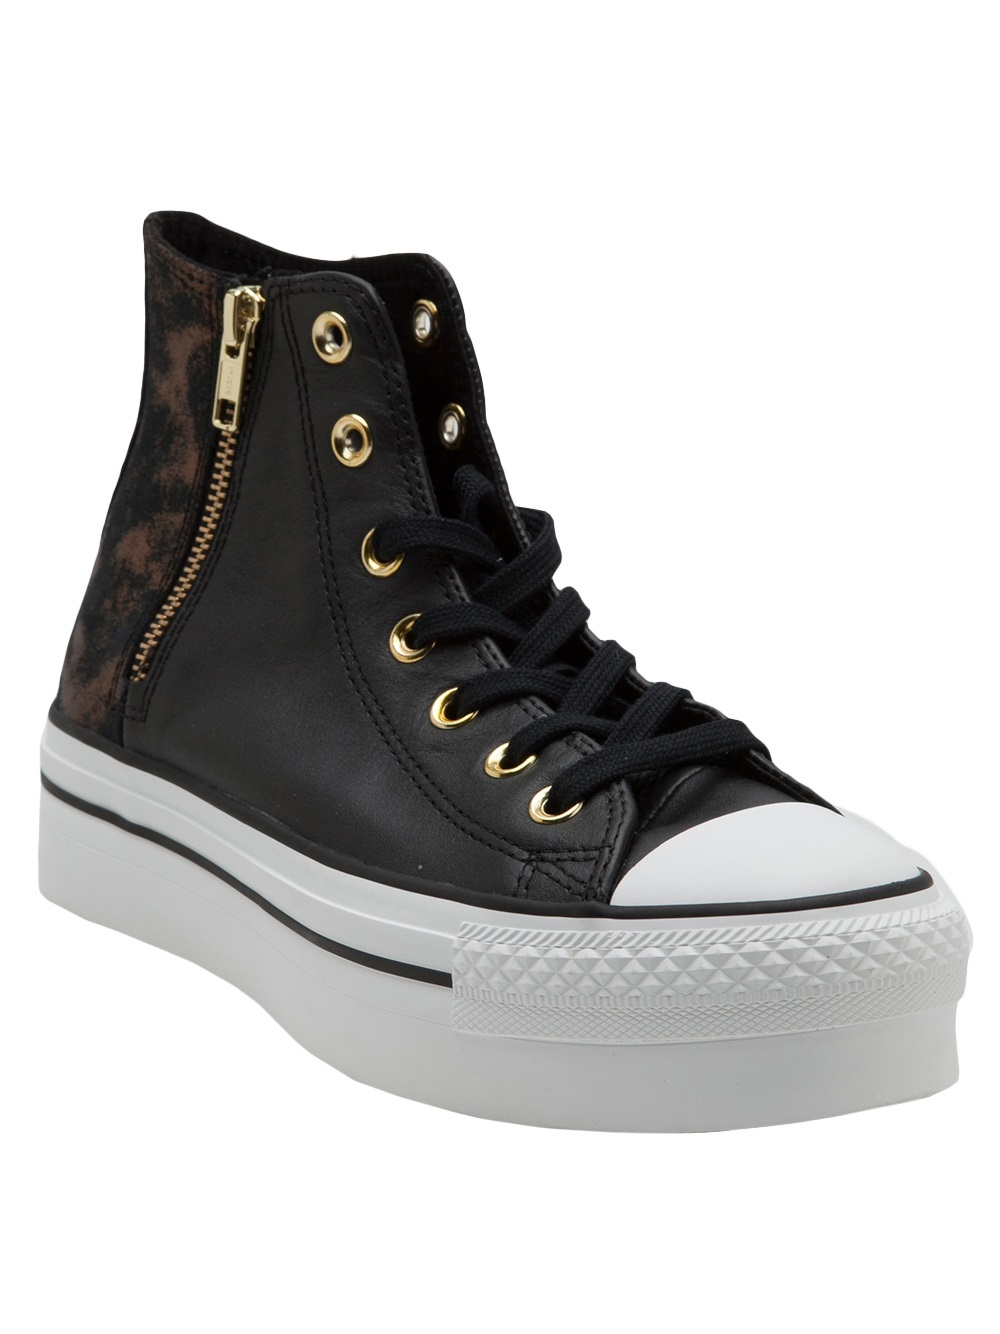 94dd4a1c2b92 Black Lyst Shoe Zip in Converse Platform FqqXwg7xH